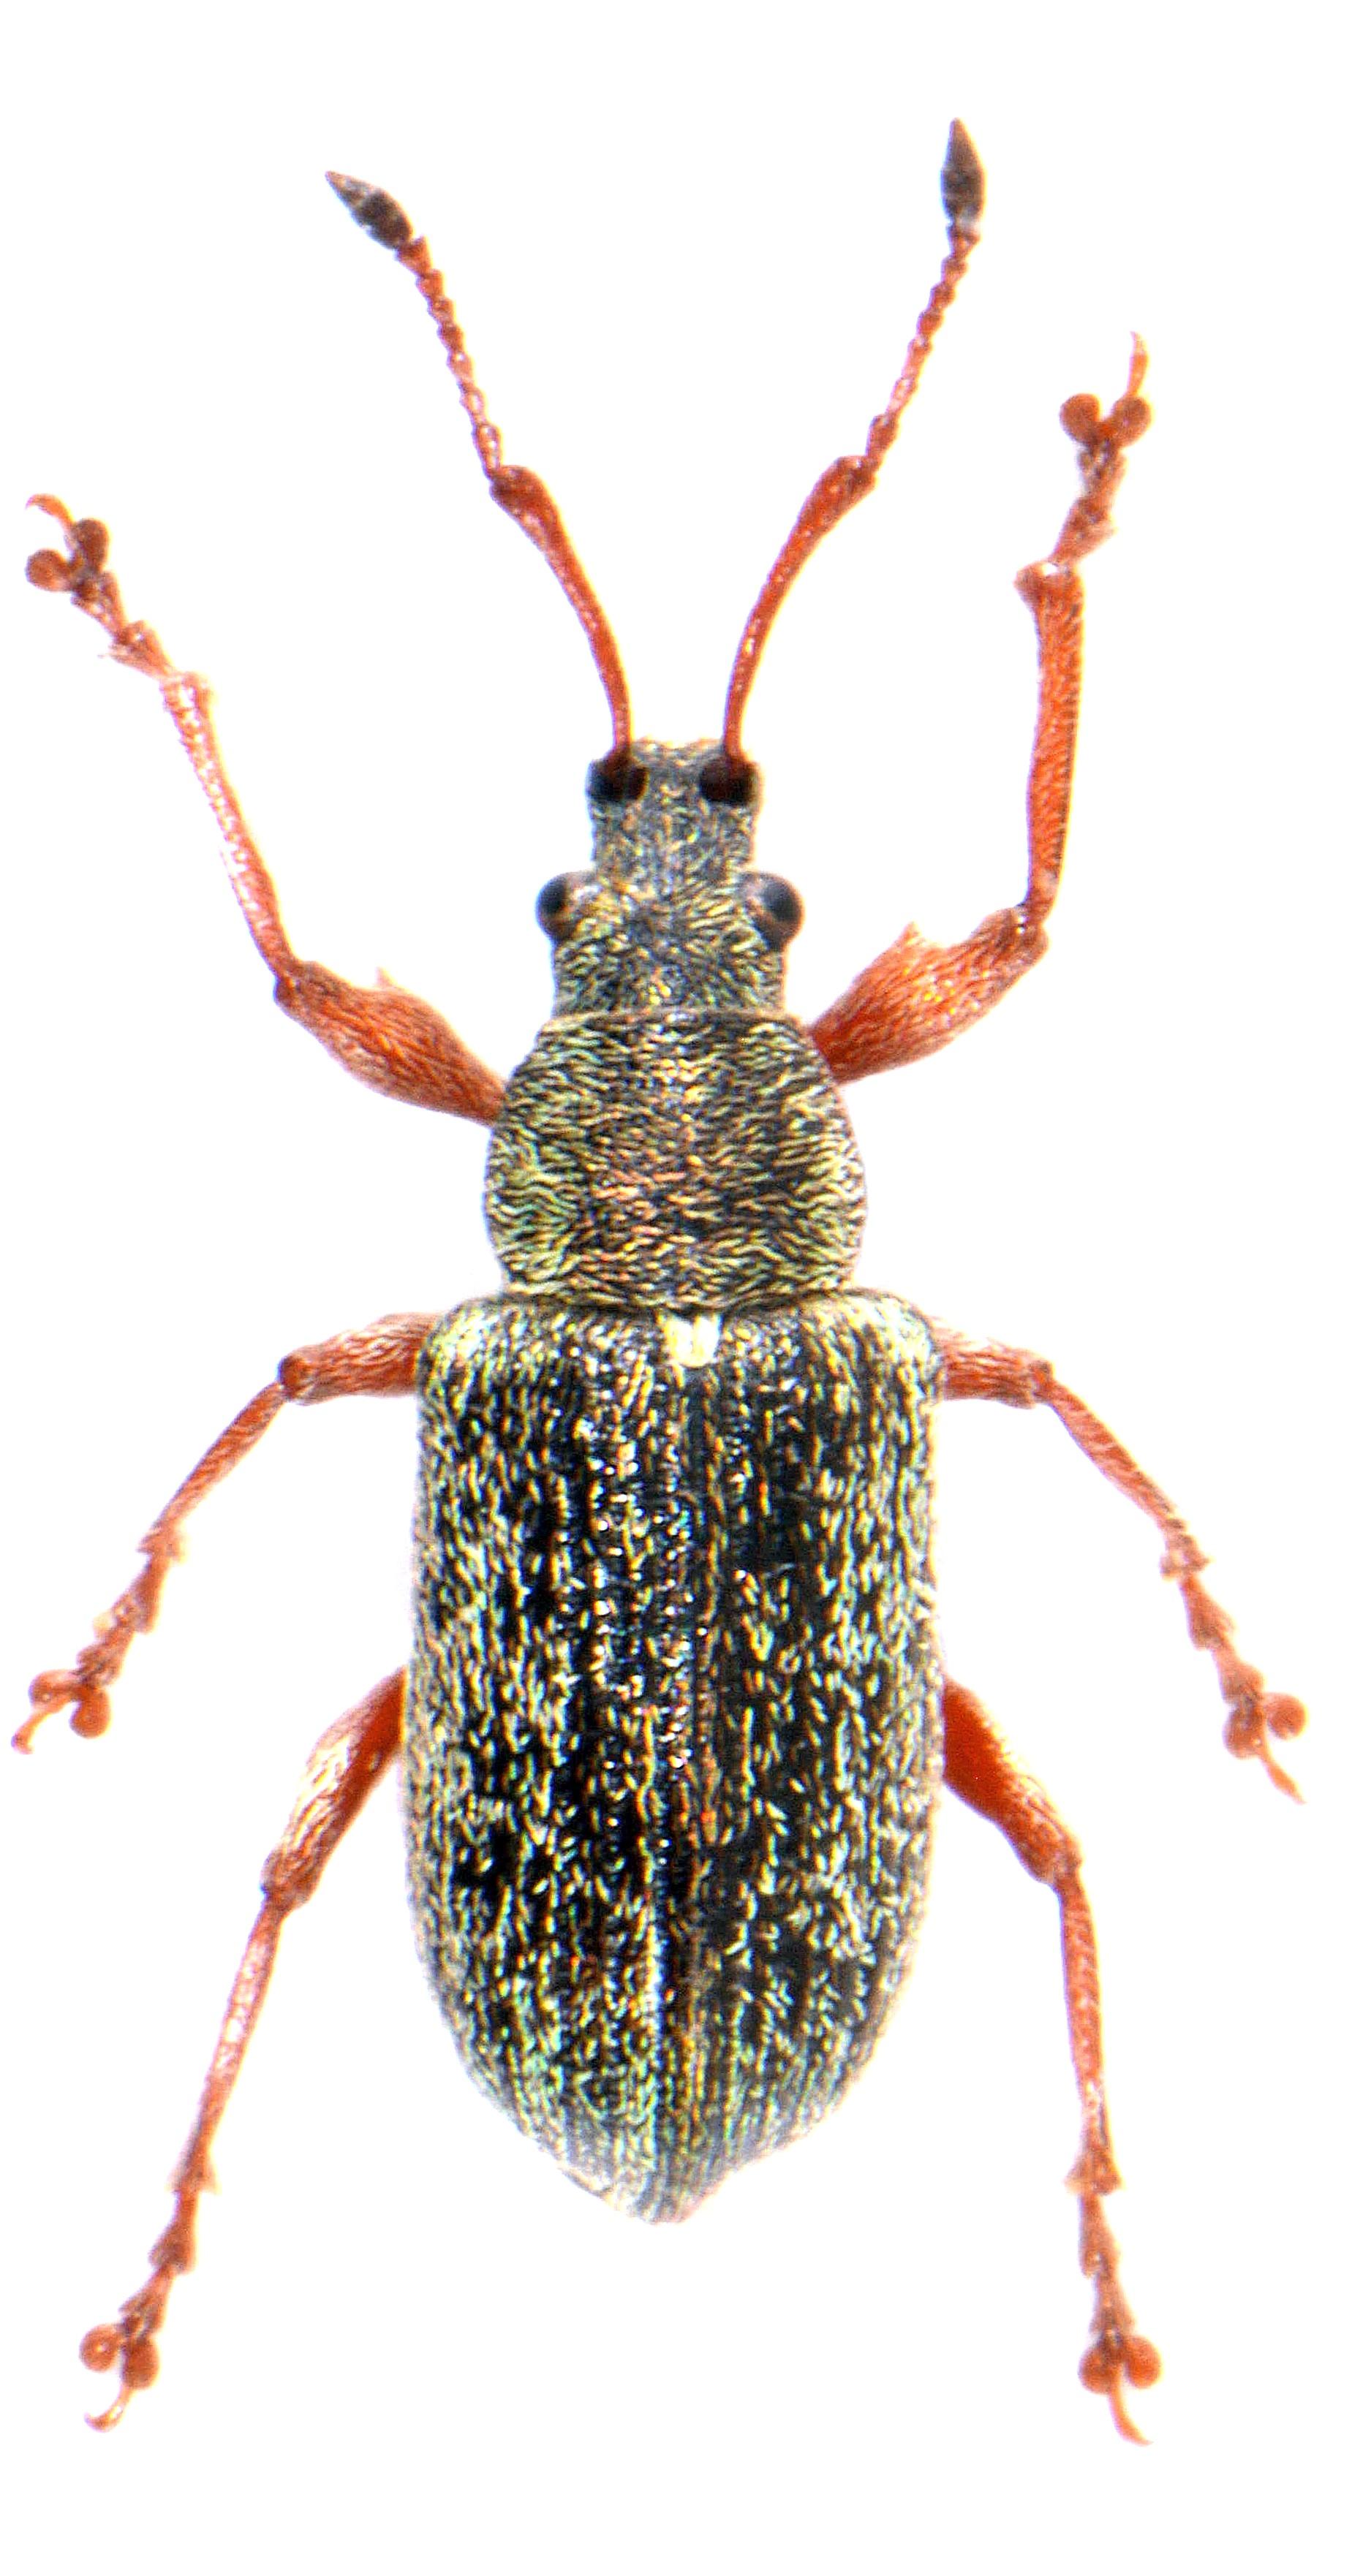 Phyllobius pyri ♂